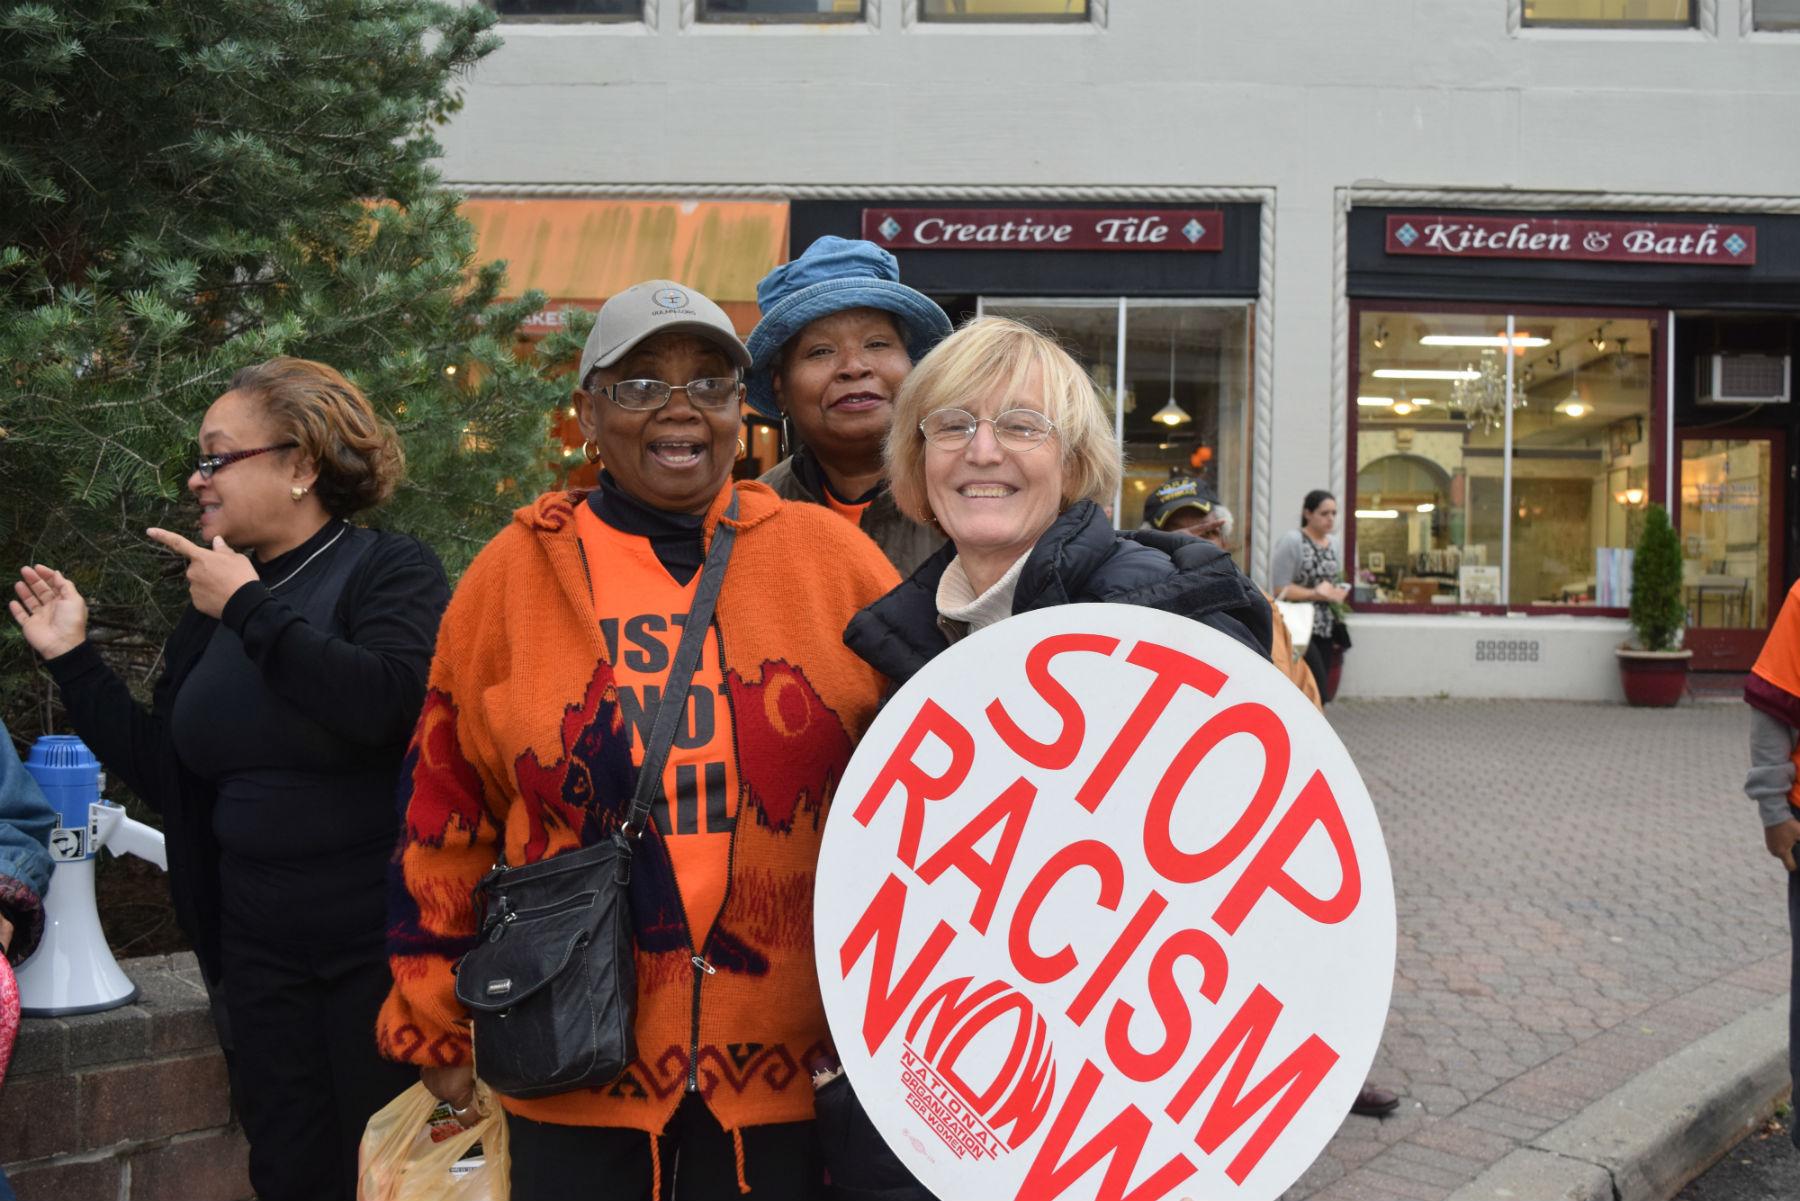 ed891f2146b7827de4a9_end.racism.jpg